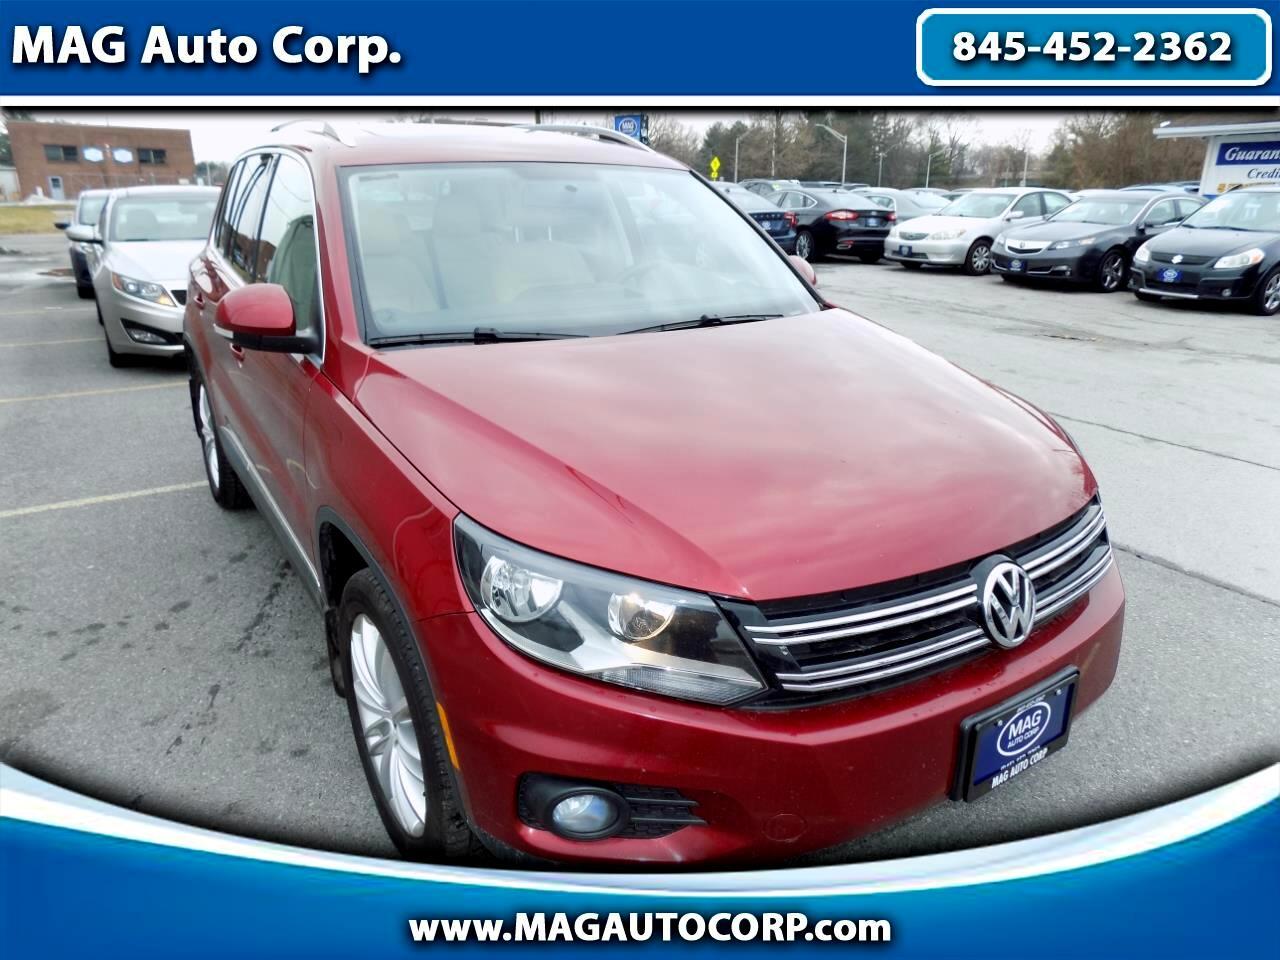 Volkswagen Tiguan 2.0T SEL Premium 4MOTION 2013